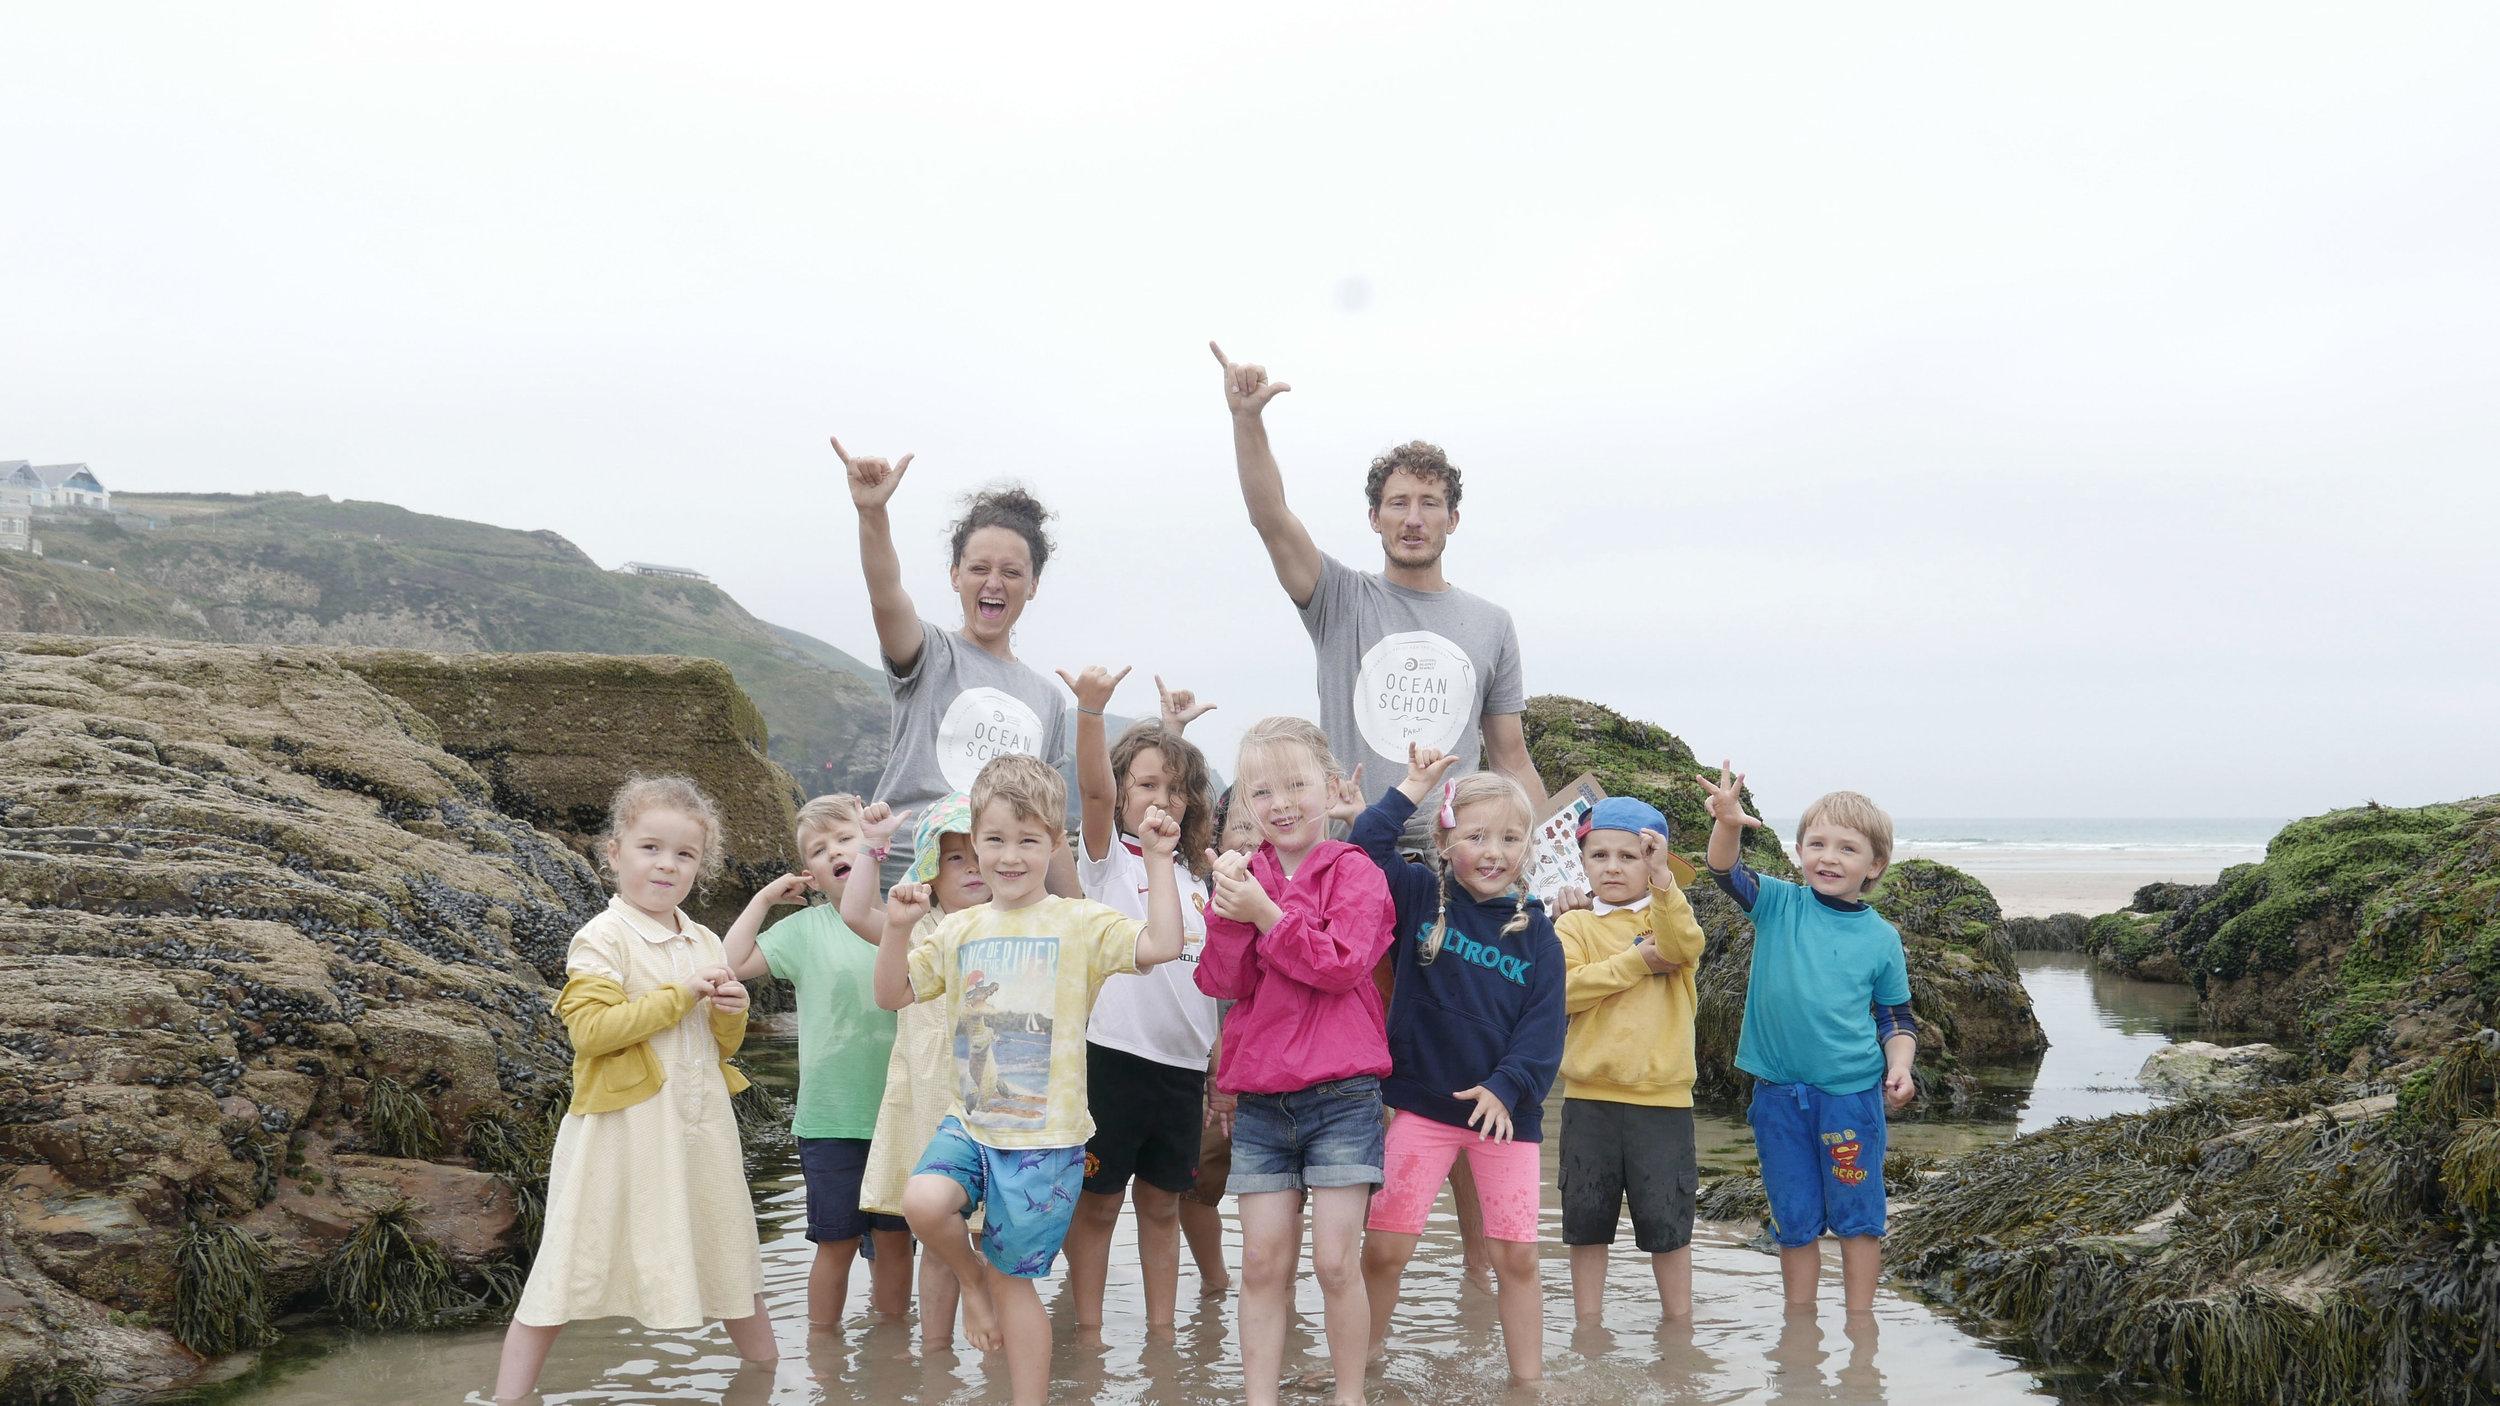 Ocean-School-at-Perranporth-with-Creed-Primary----(C)-Taylor-Butler-Eldridge-(6).jpg